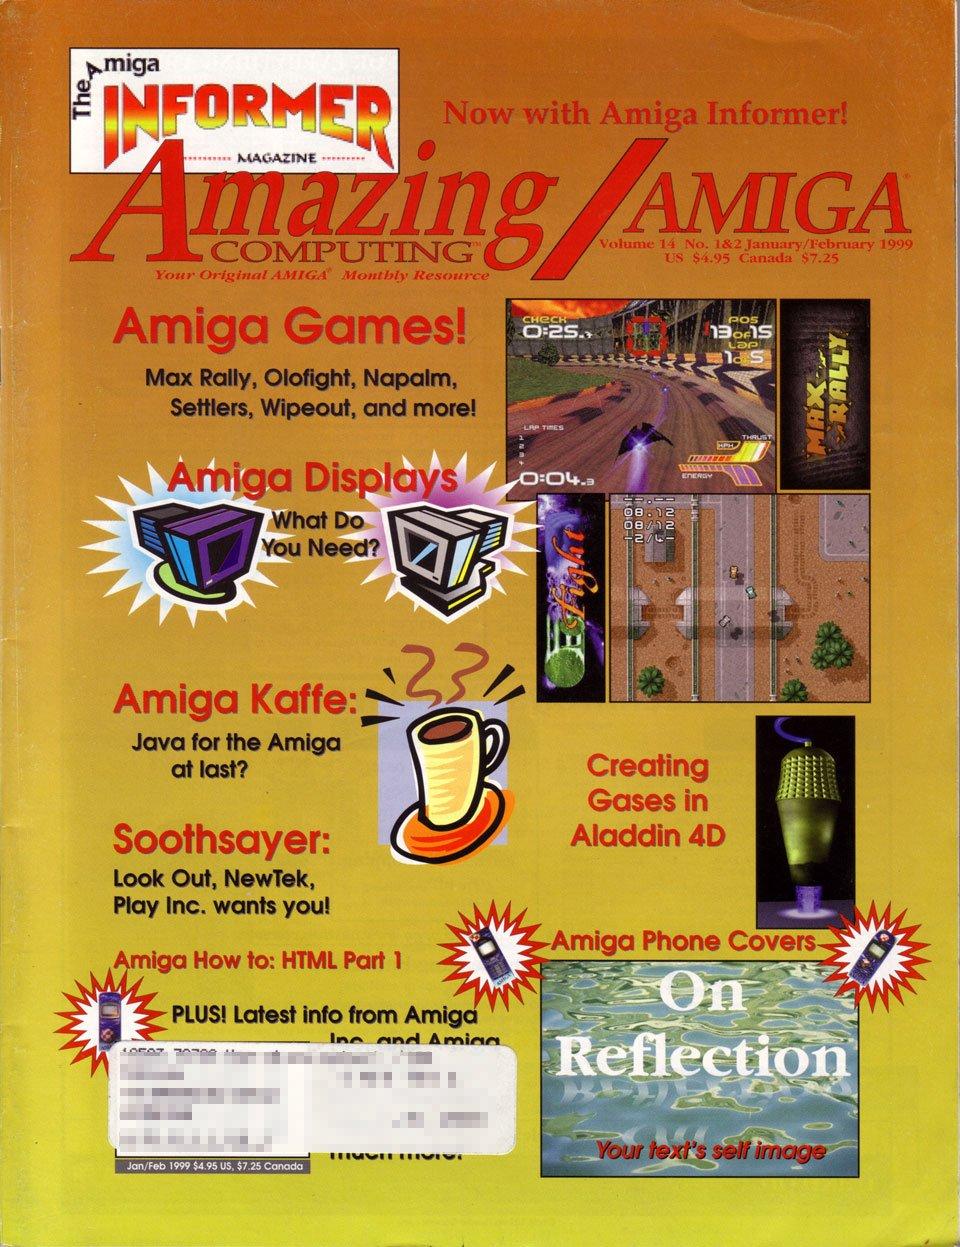 Amazing Computing Issue 151 Vol. 14 No. 01/02 (January/February 1999)